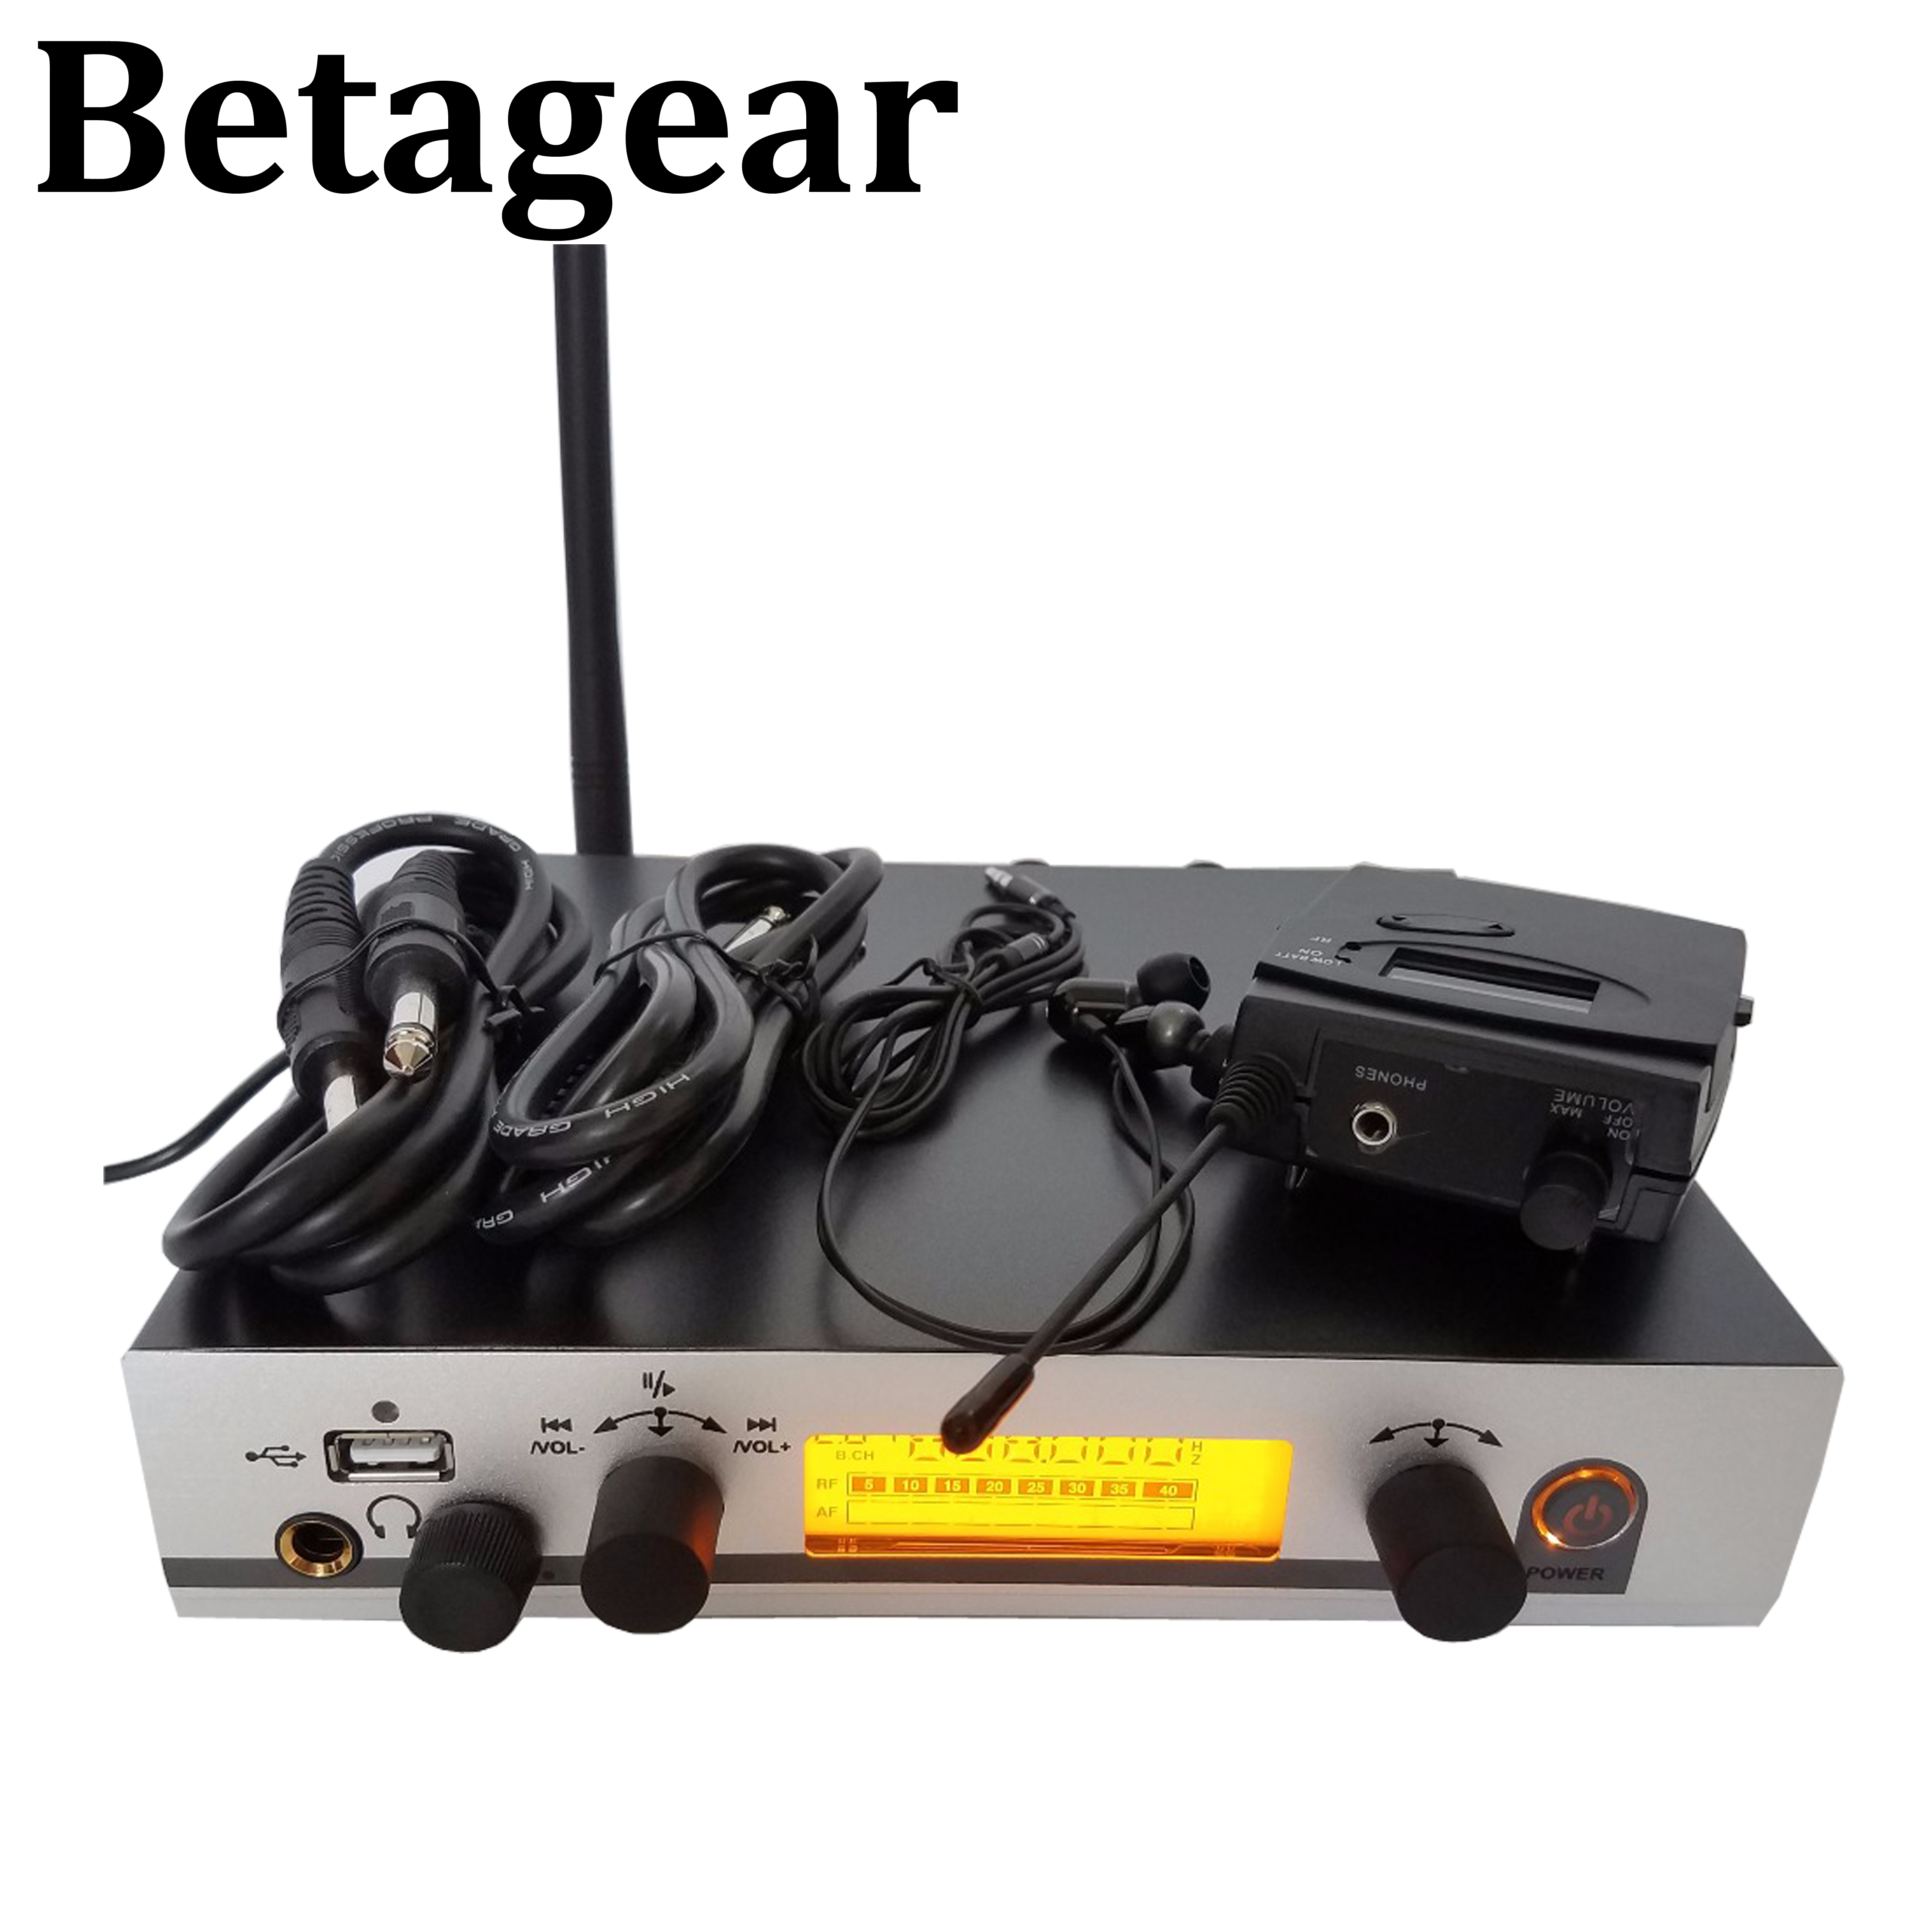 Betagear In-Ear Monitoring System 300IEM G3 SR300 IEM Persönlichen Monitor Drahtlose System in ear-monitor-system audio profesional